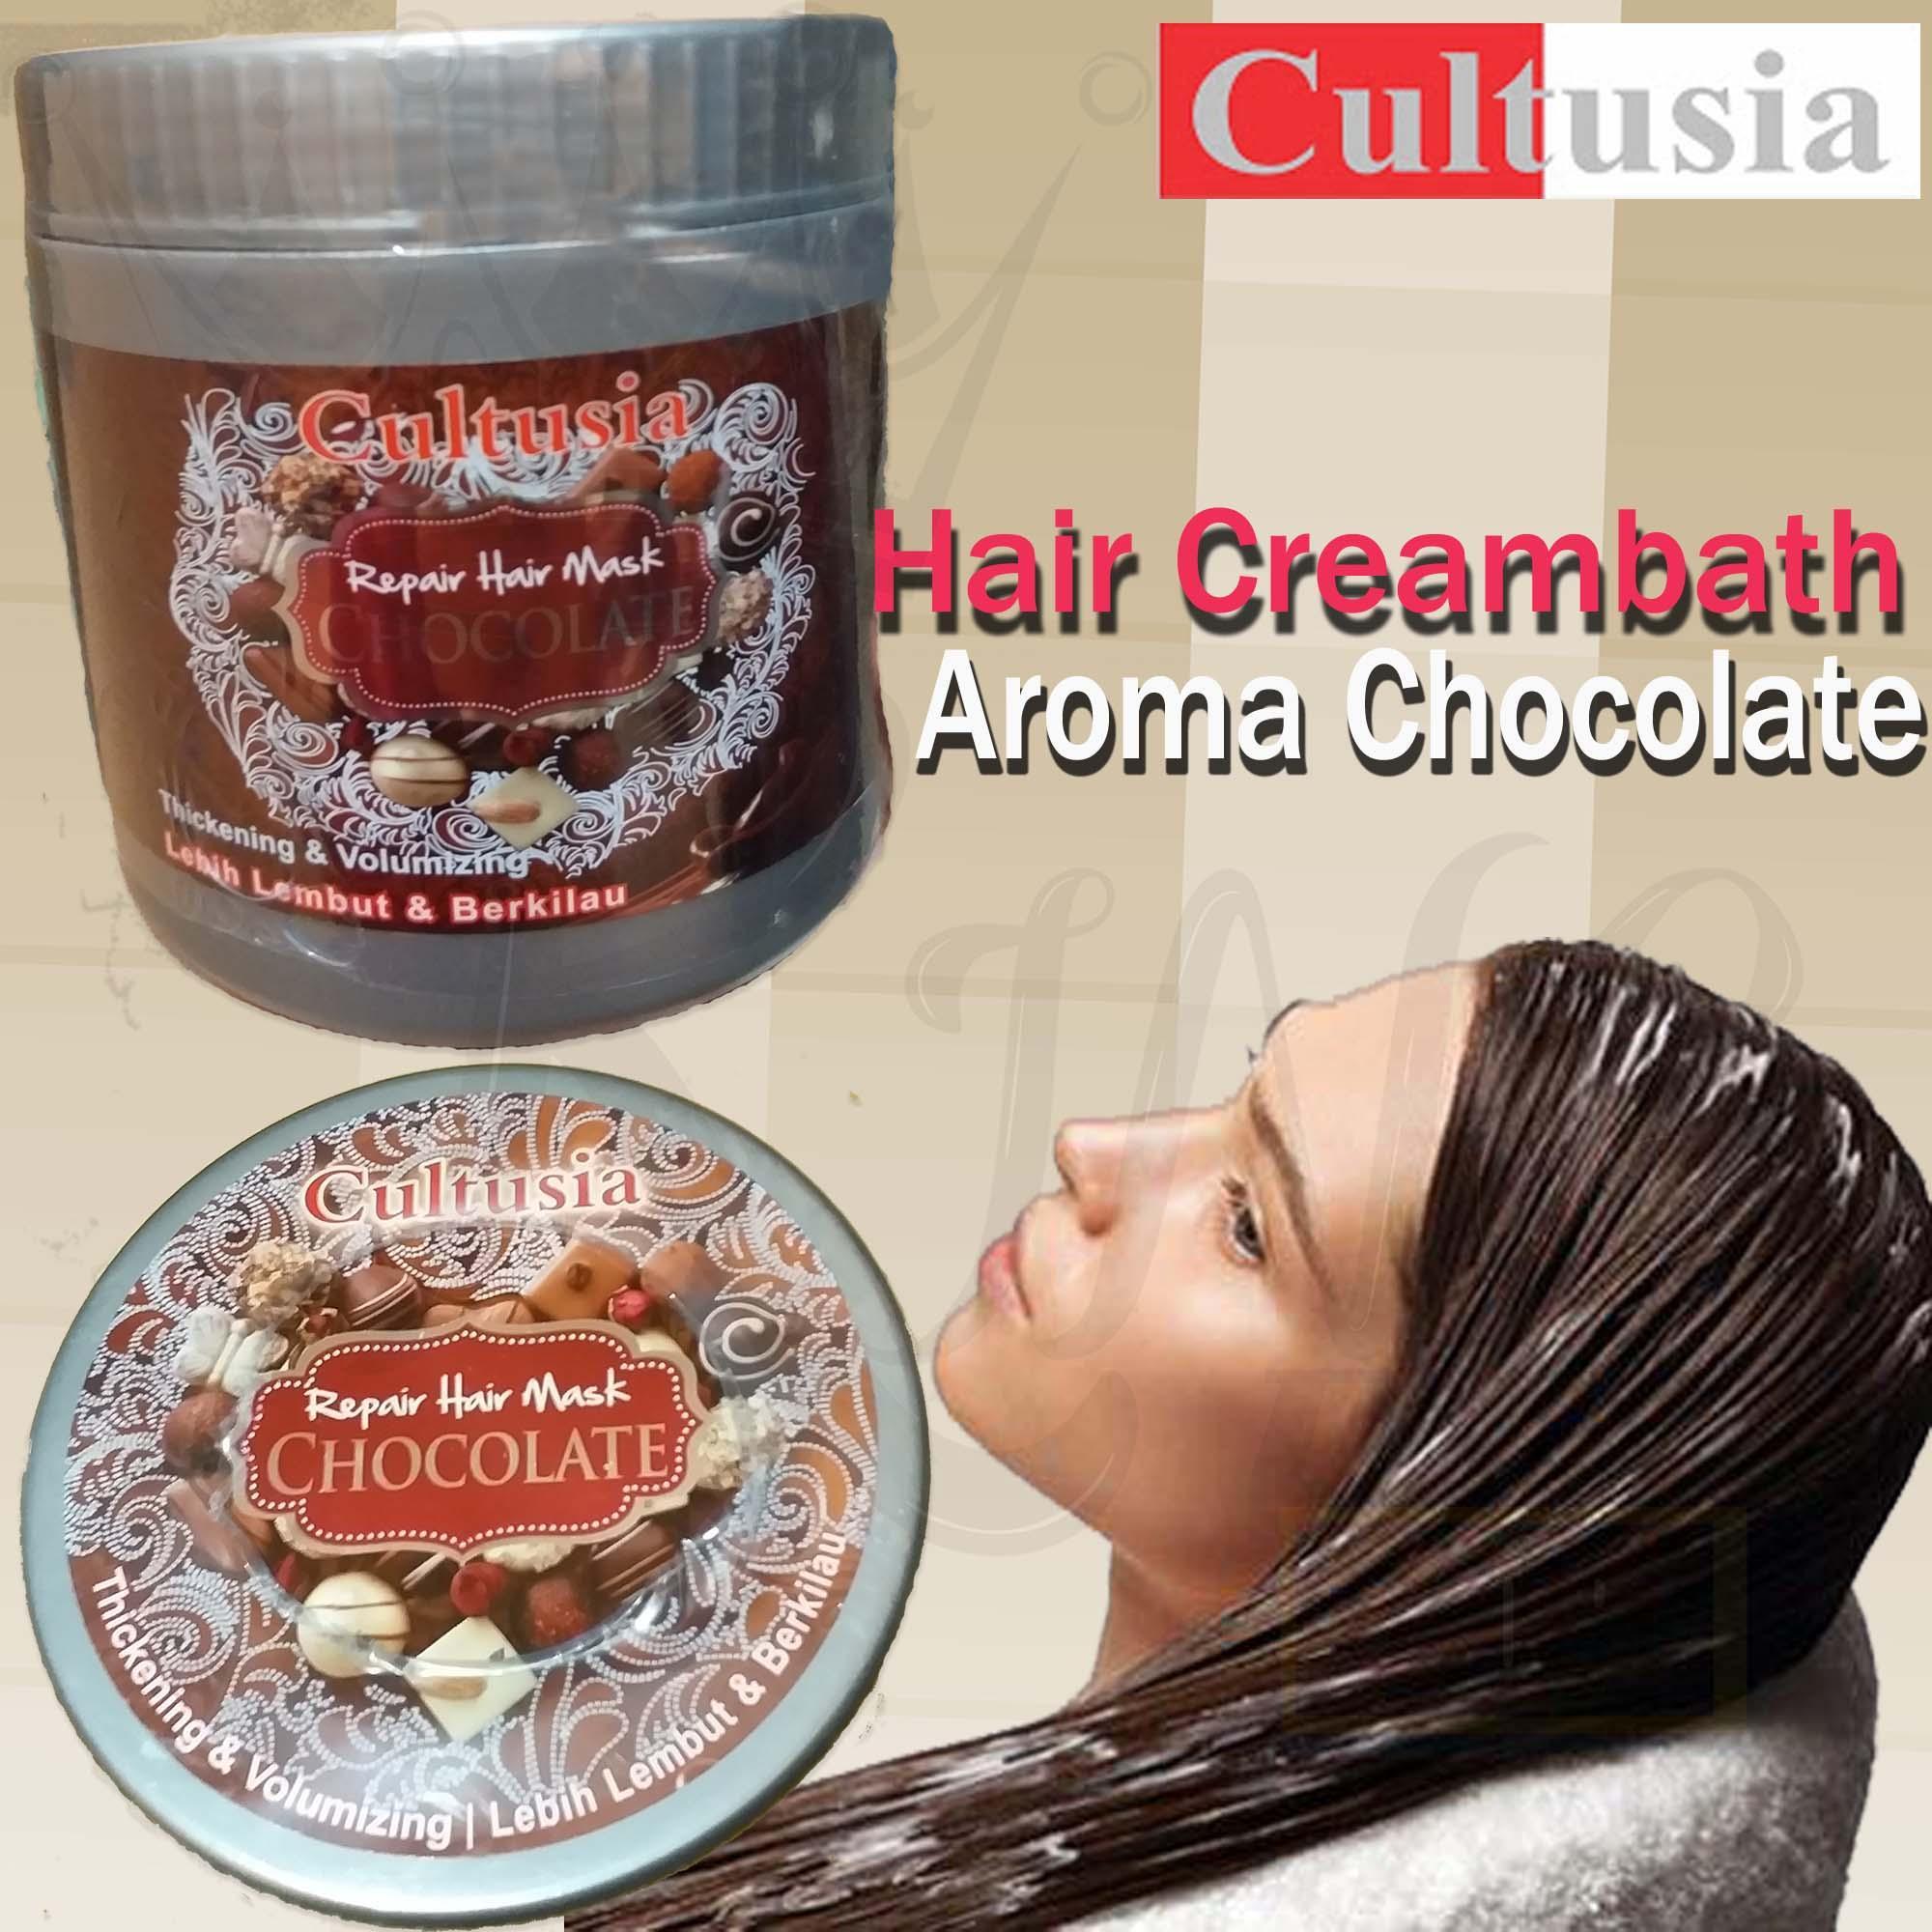 Cultusia Hairmask Chocolate 1000ml Daftar Update Harga Terbaru Dan Hair Mask Fruit 25ml 405060 Creambath 500ml Aroma Cocoa